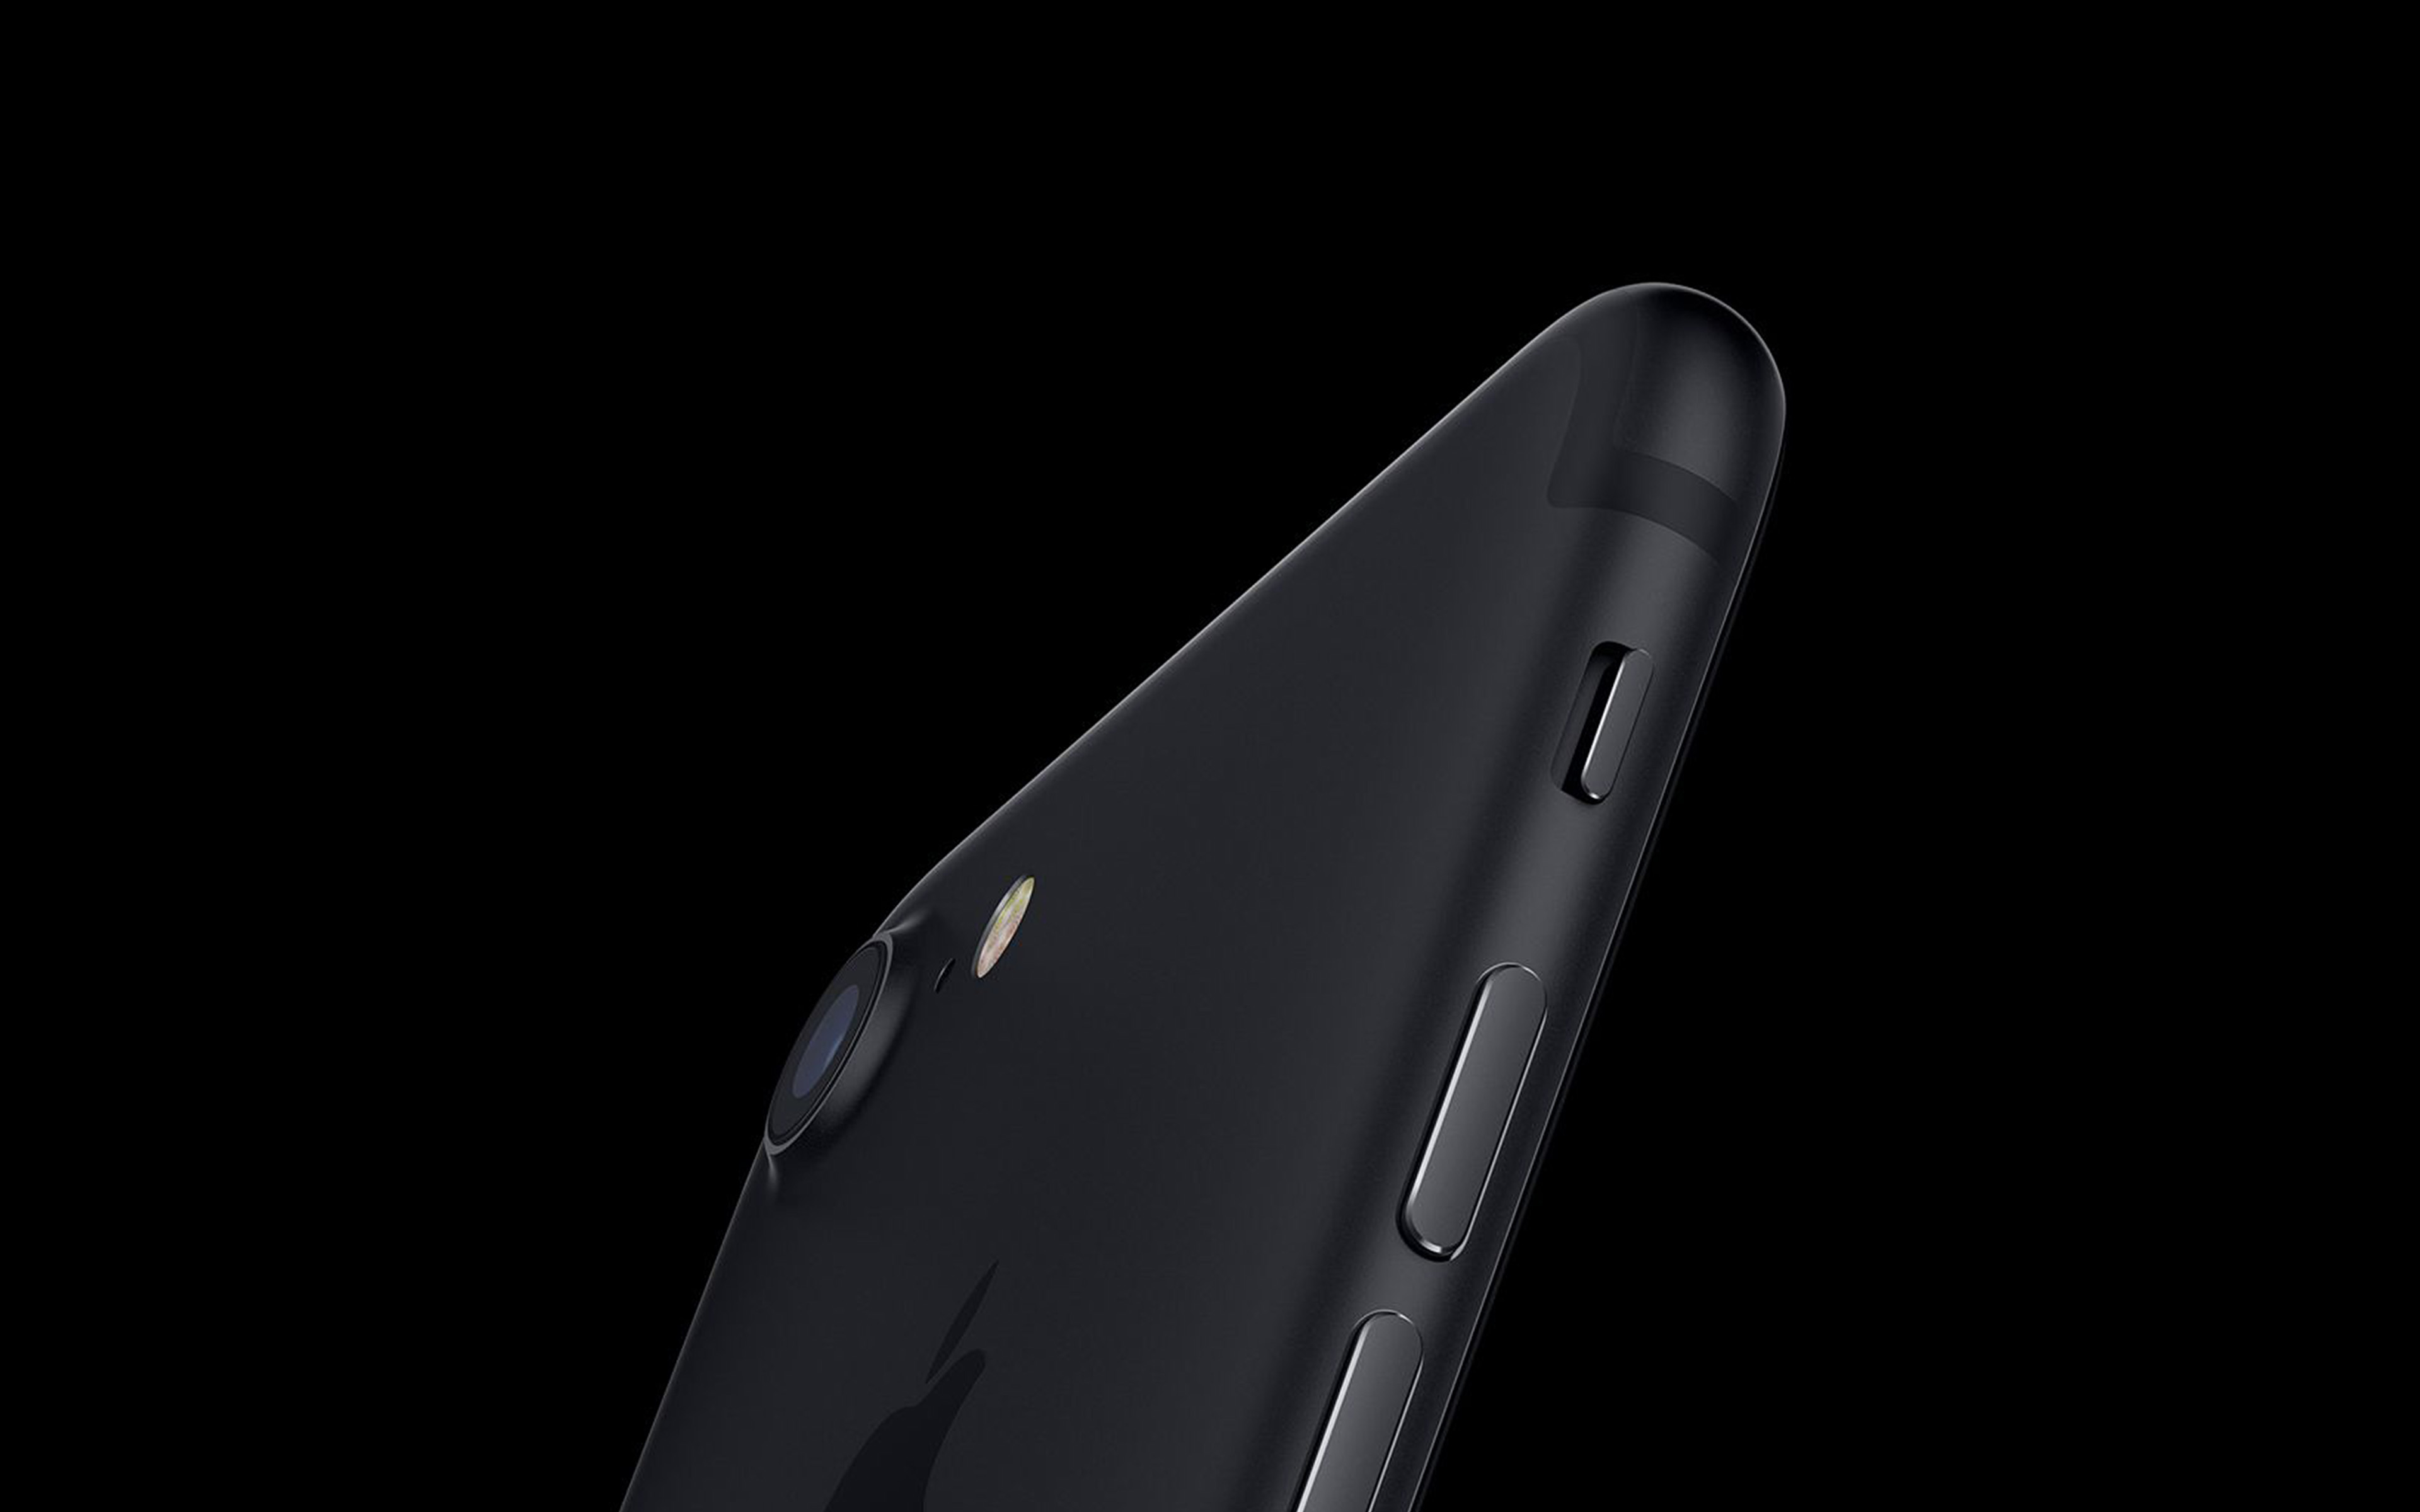 At24 Apple Iphone7 Black Plus Dark Art Illustration Wallpaper